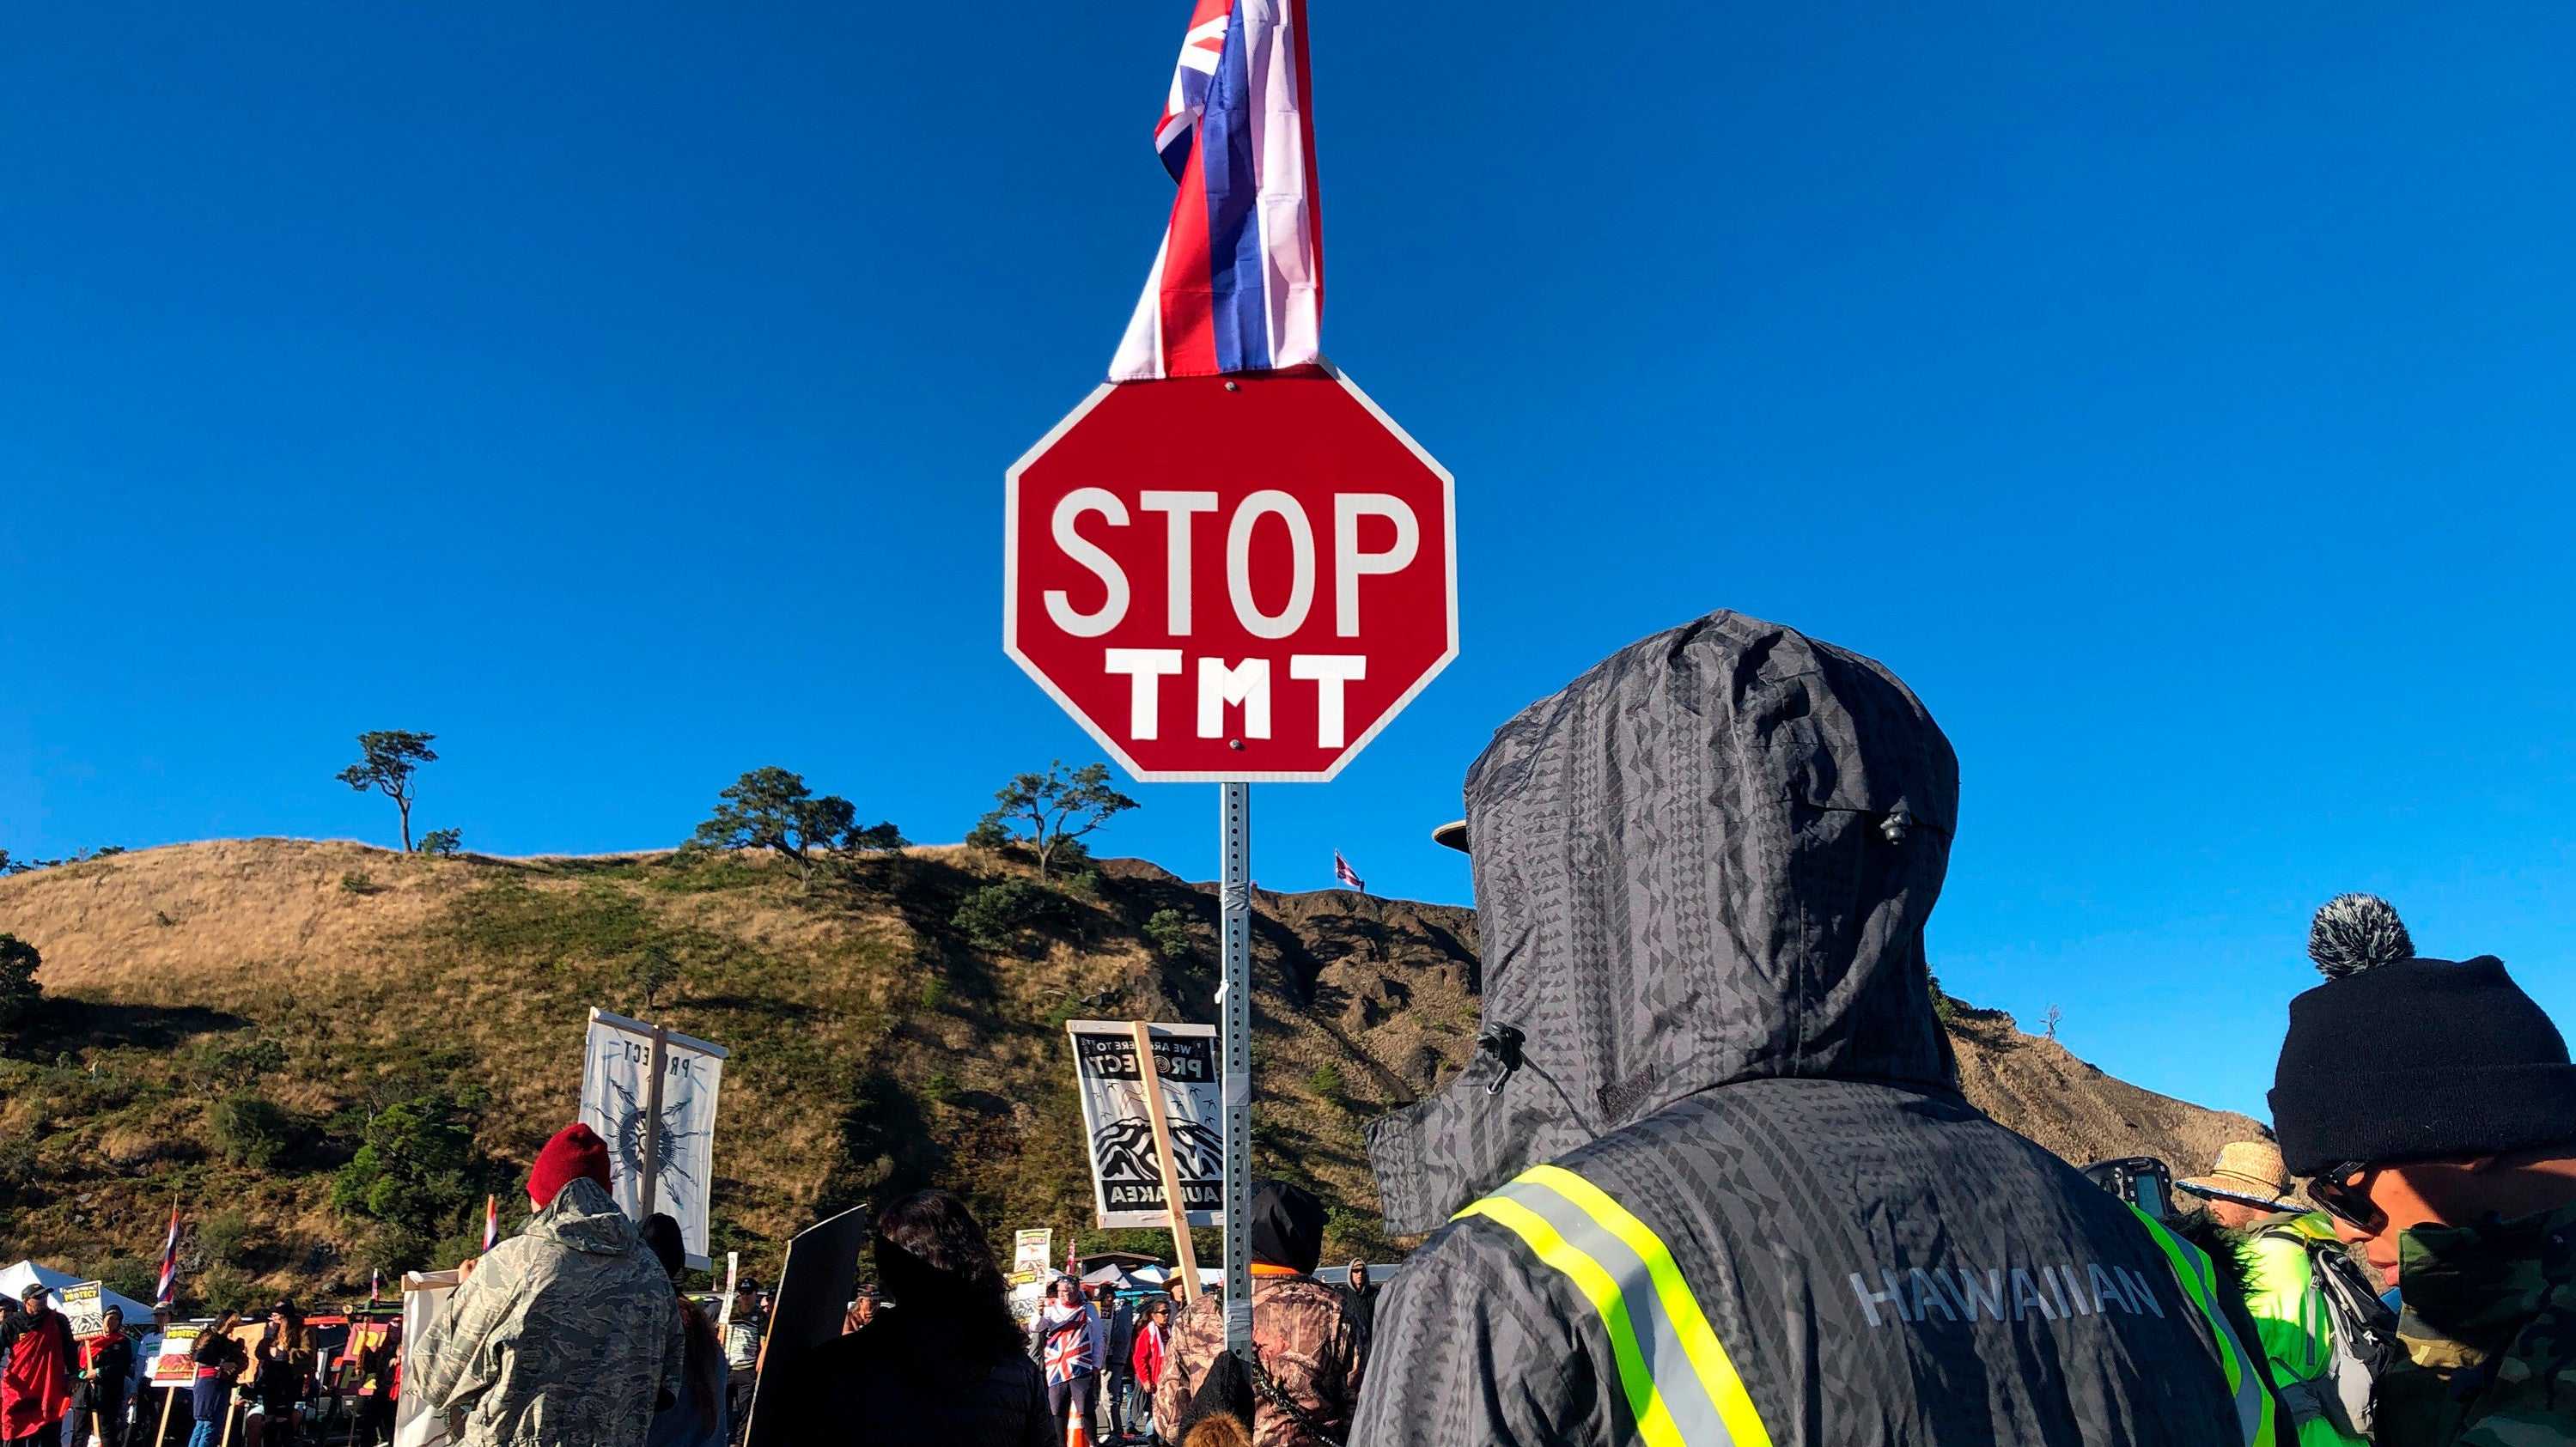 Hundreds Of Protestors Block Work Crews Ahead Of Thirty Meter Telescope Construction In Hawaii